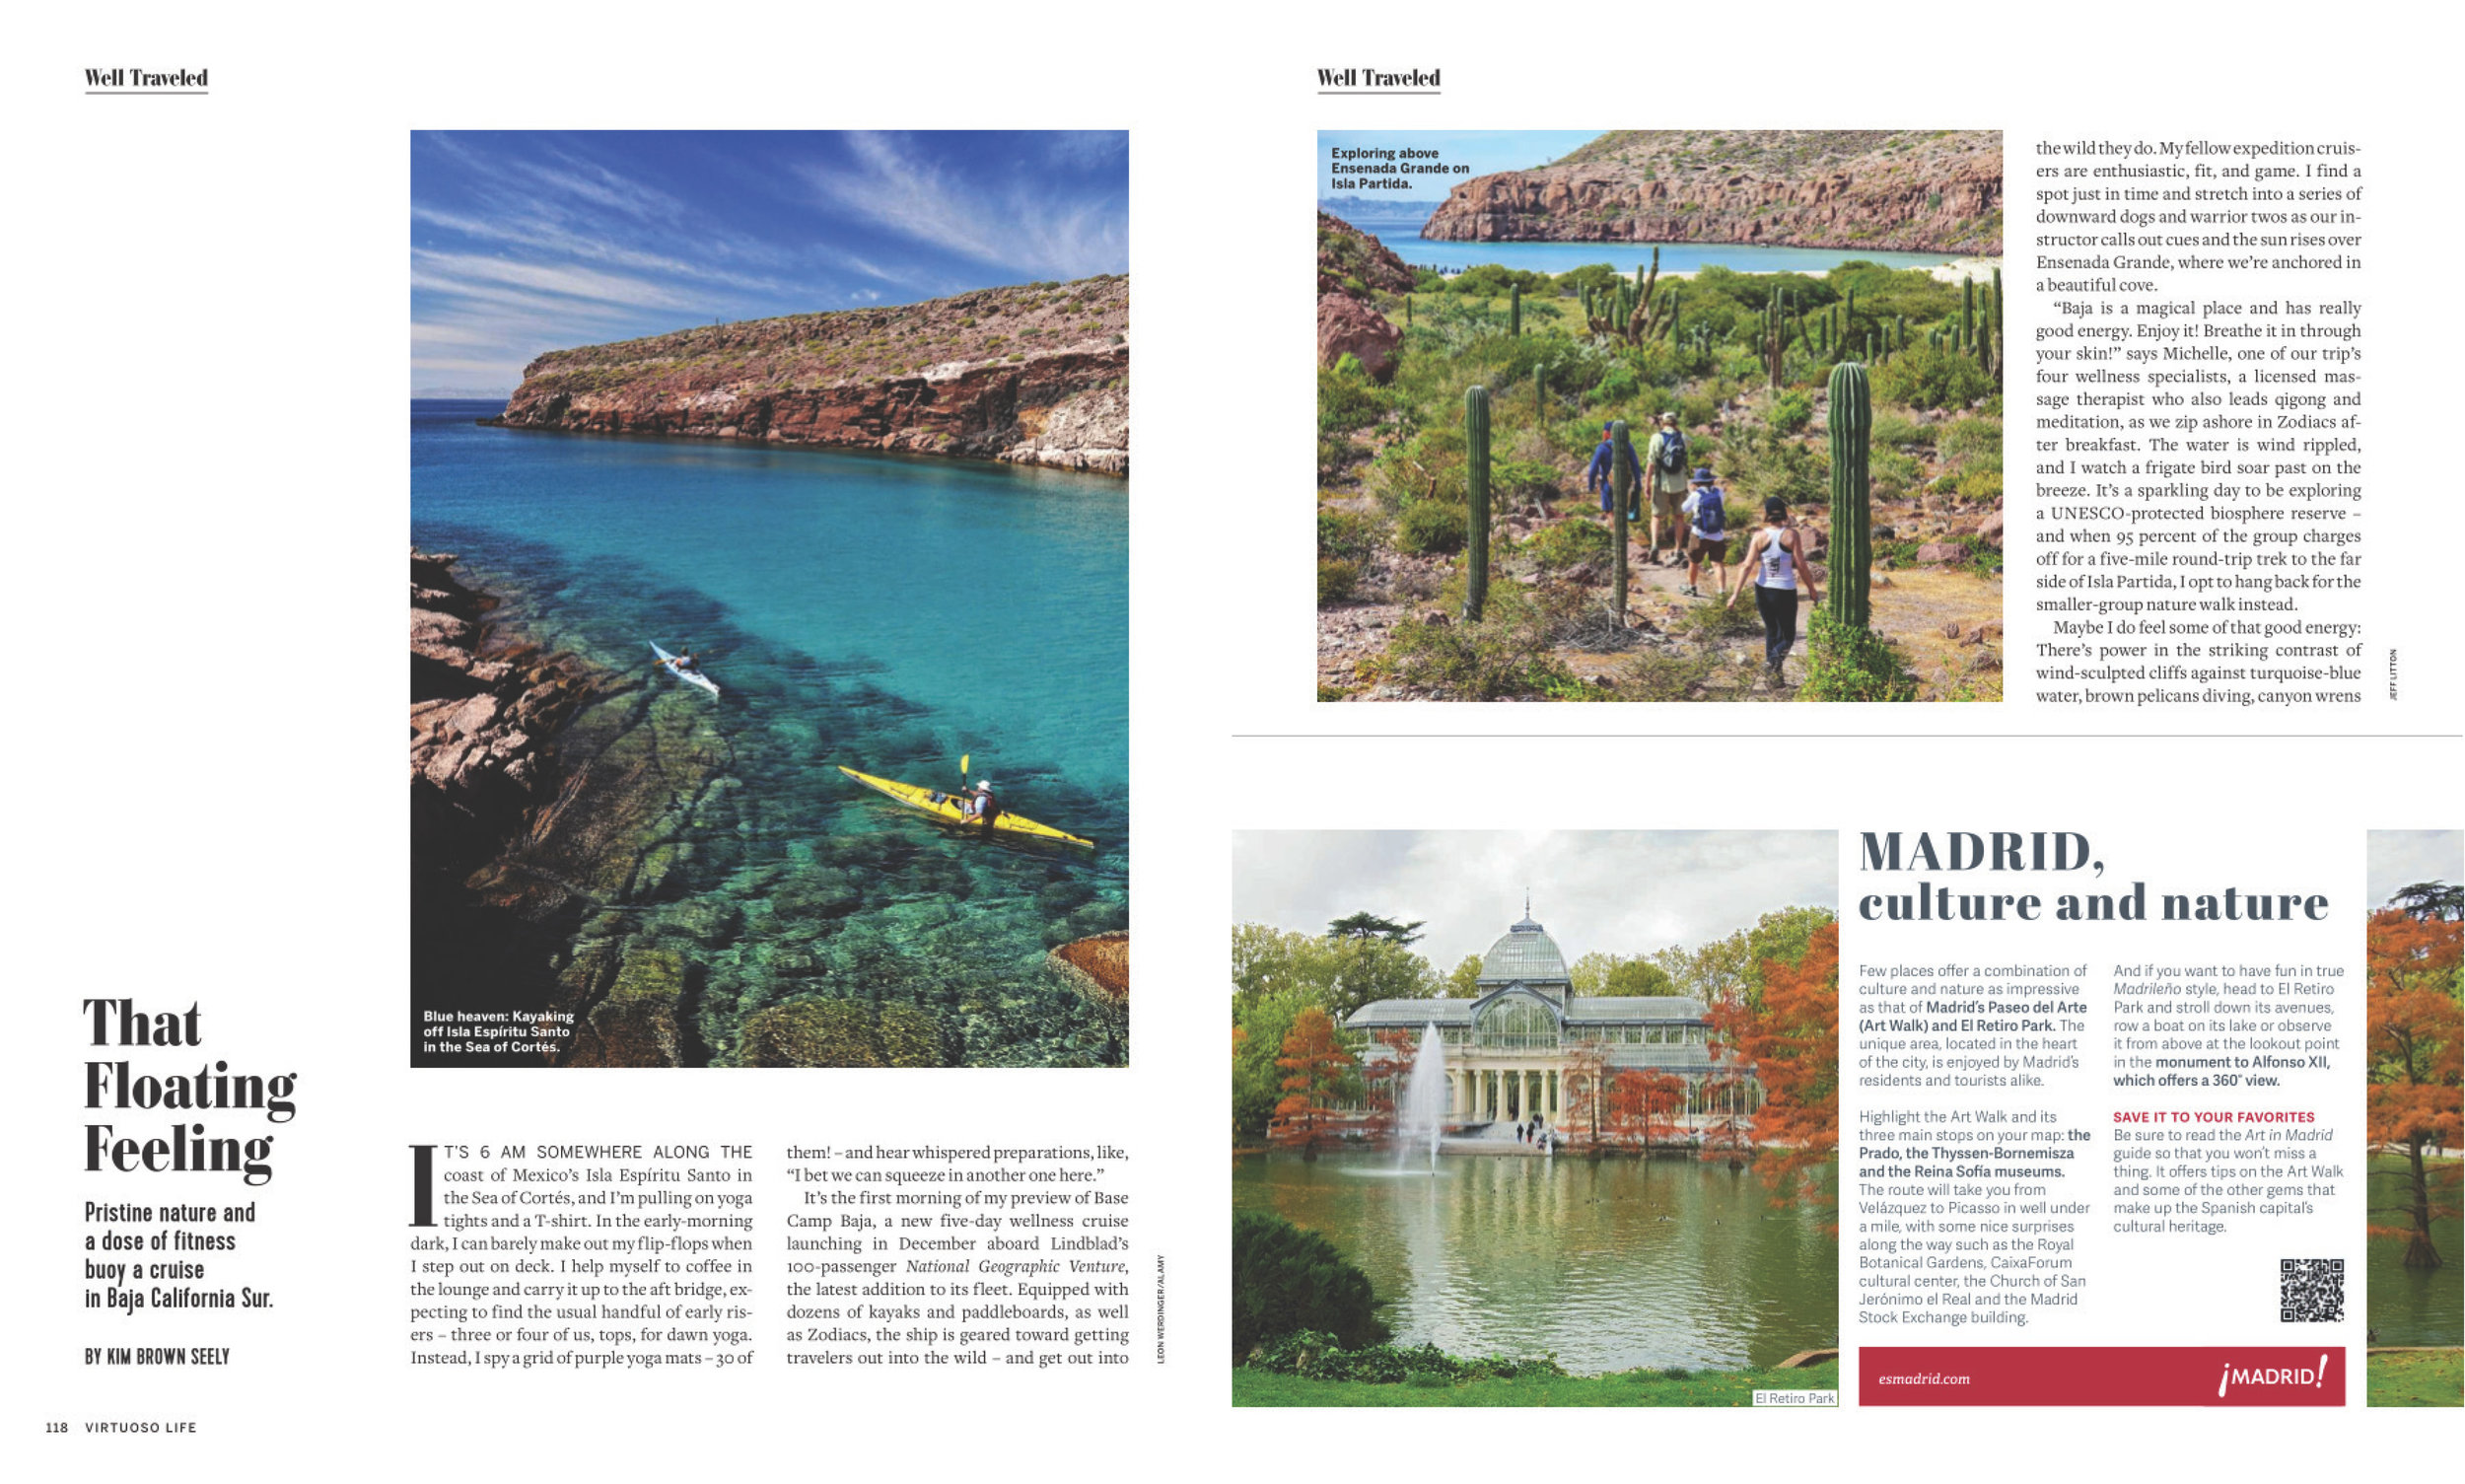 Blue heaven: Kayaking off Isla Espíritu Santo in the Sea of  Cortés